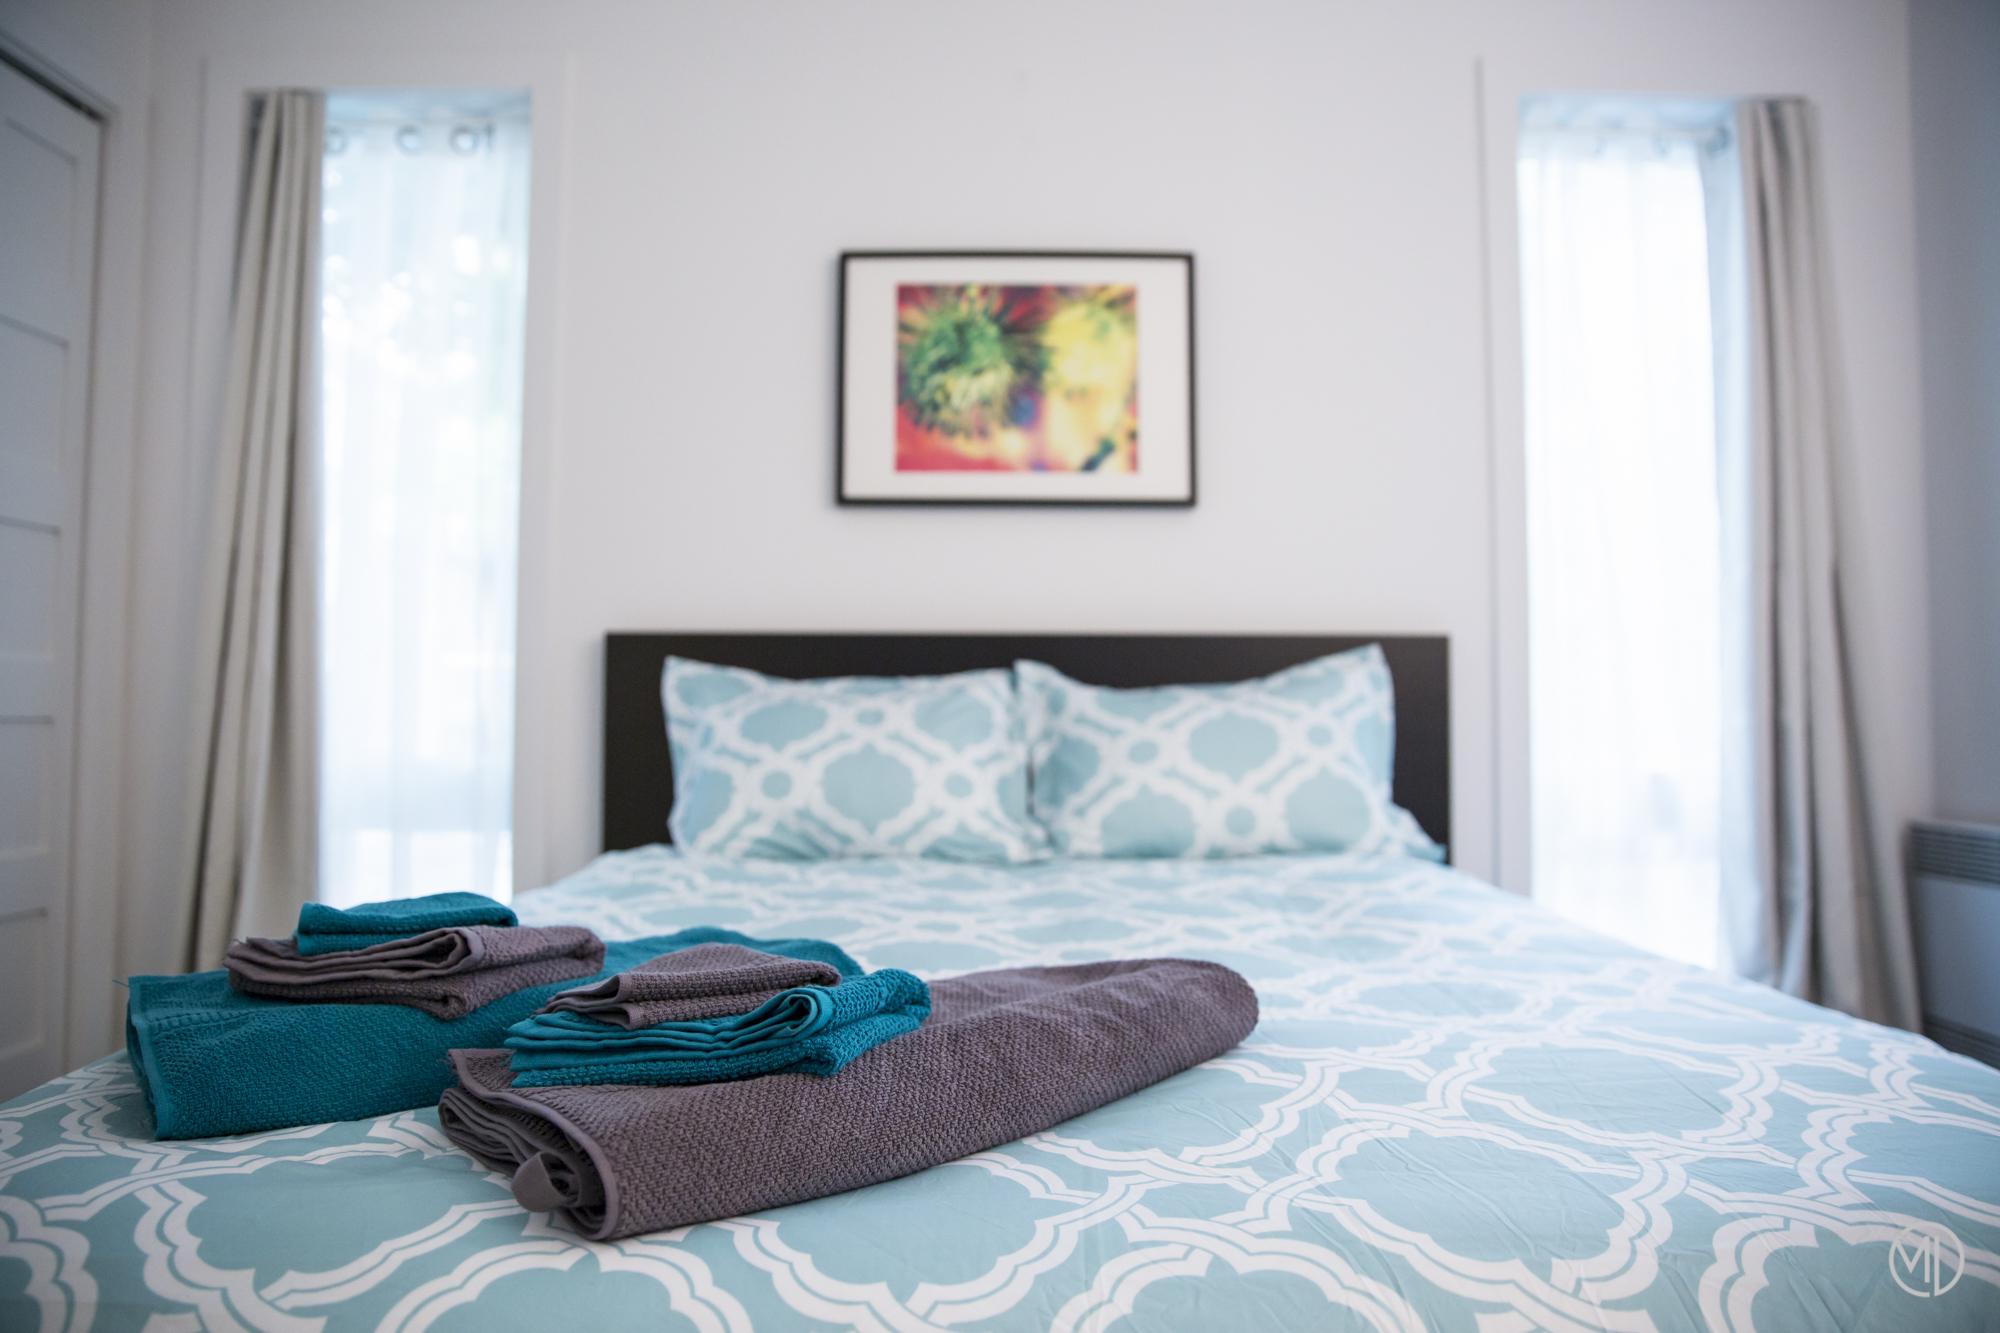 Airbnb chambre photos Montréal